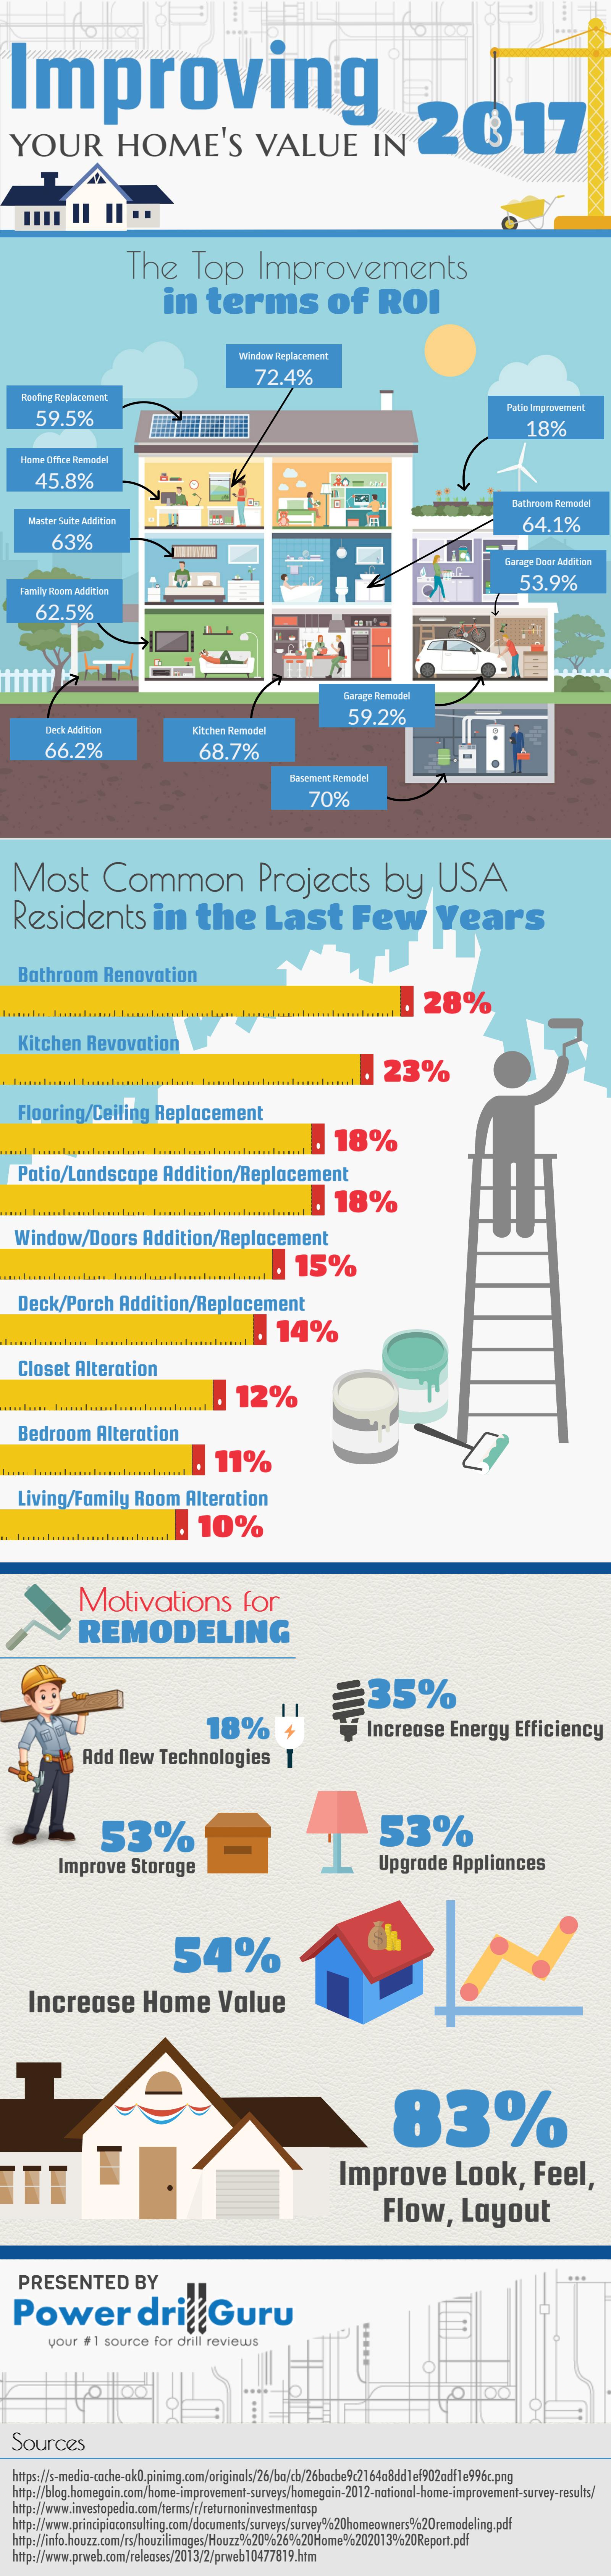 home value improvement infographic